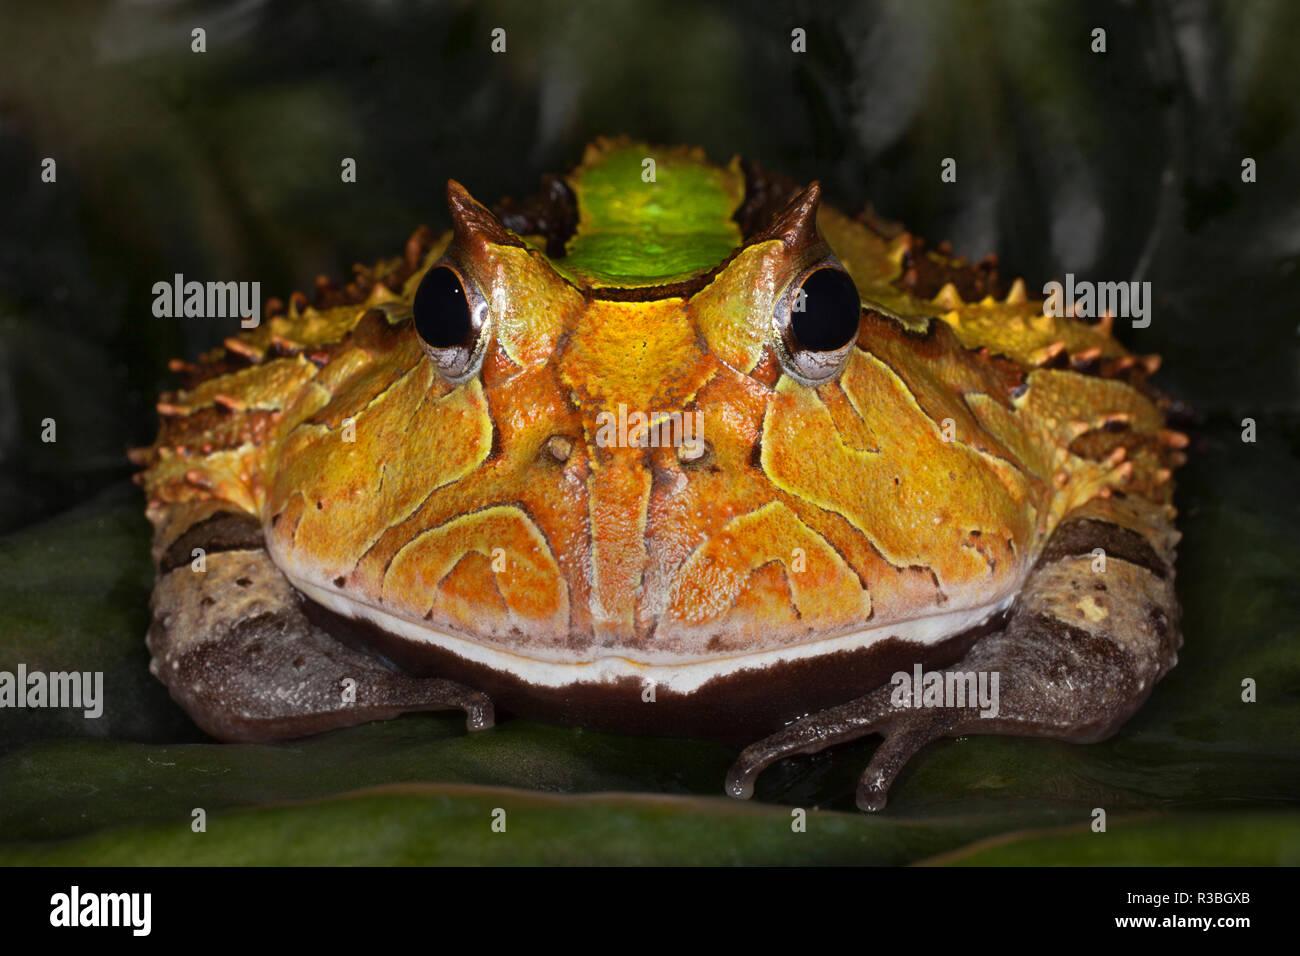 Südamerikanische horned Frog oder Pacman Frog, Ceratophrys Stockbild